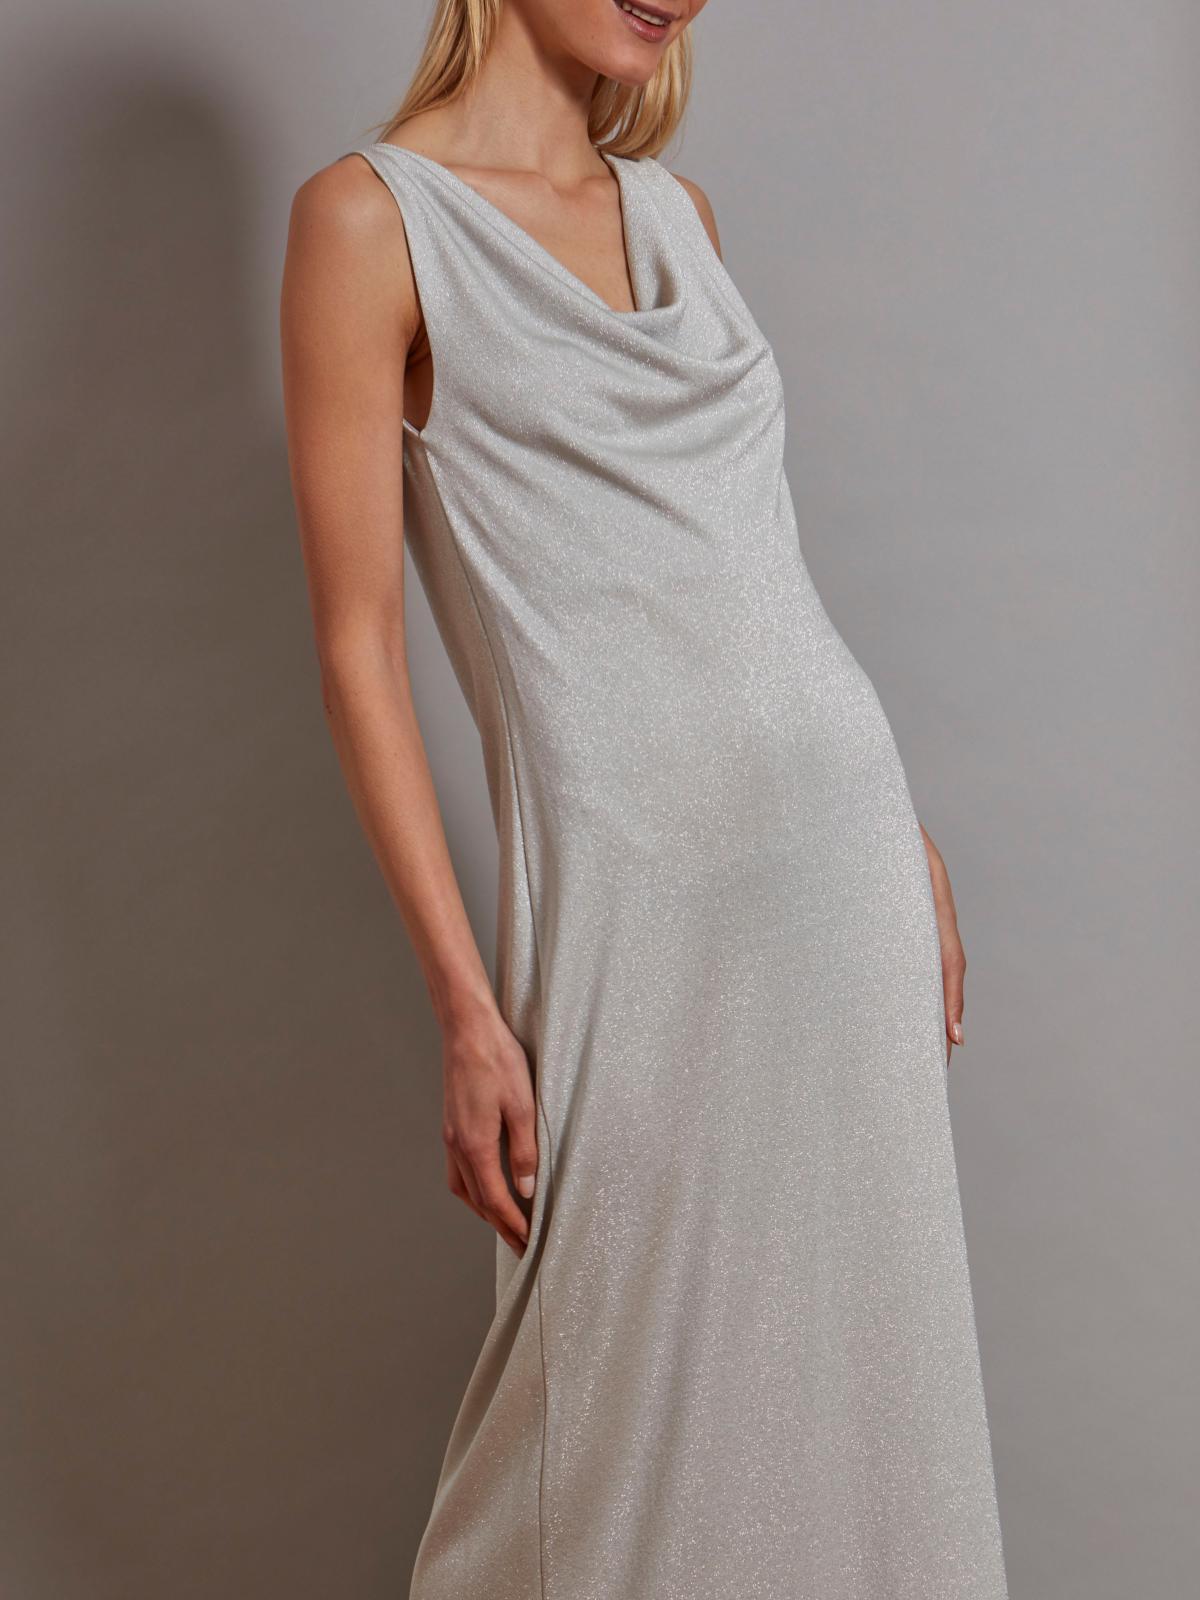 Robe Longue Lisa En Lurex Maison Lurex